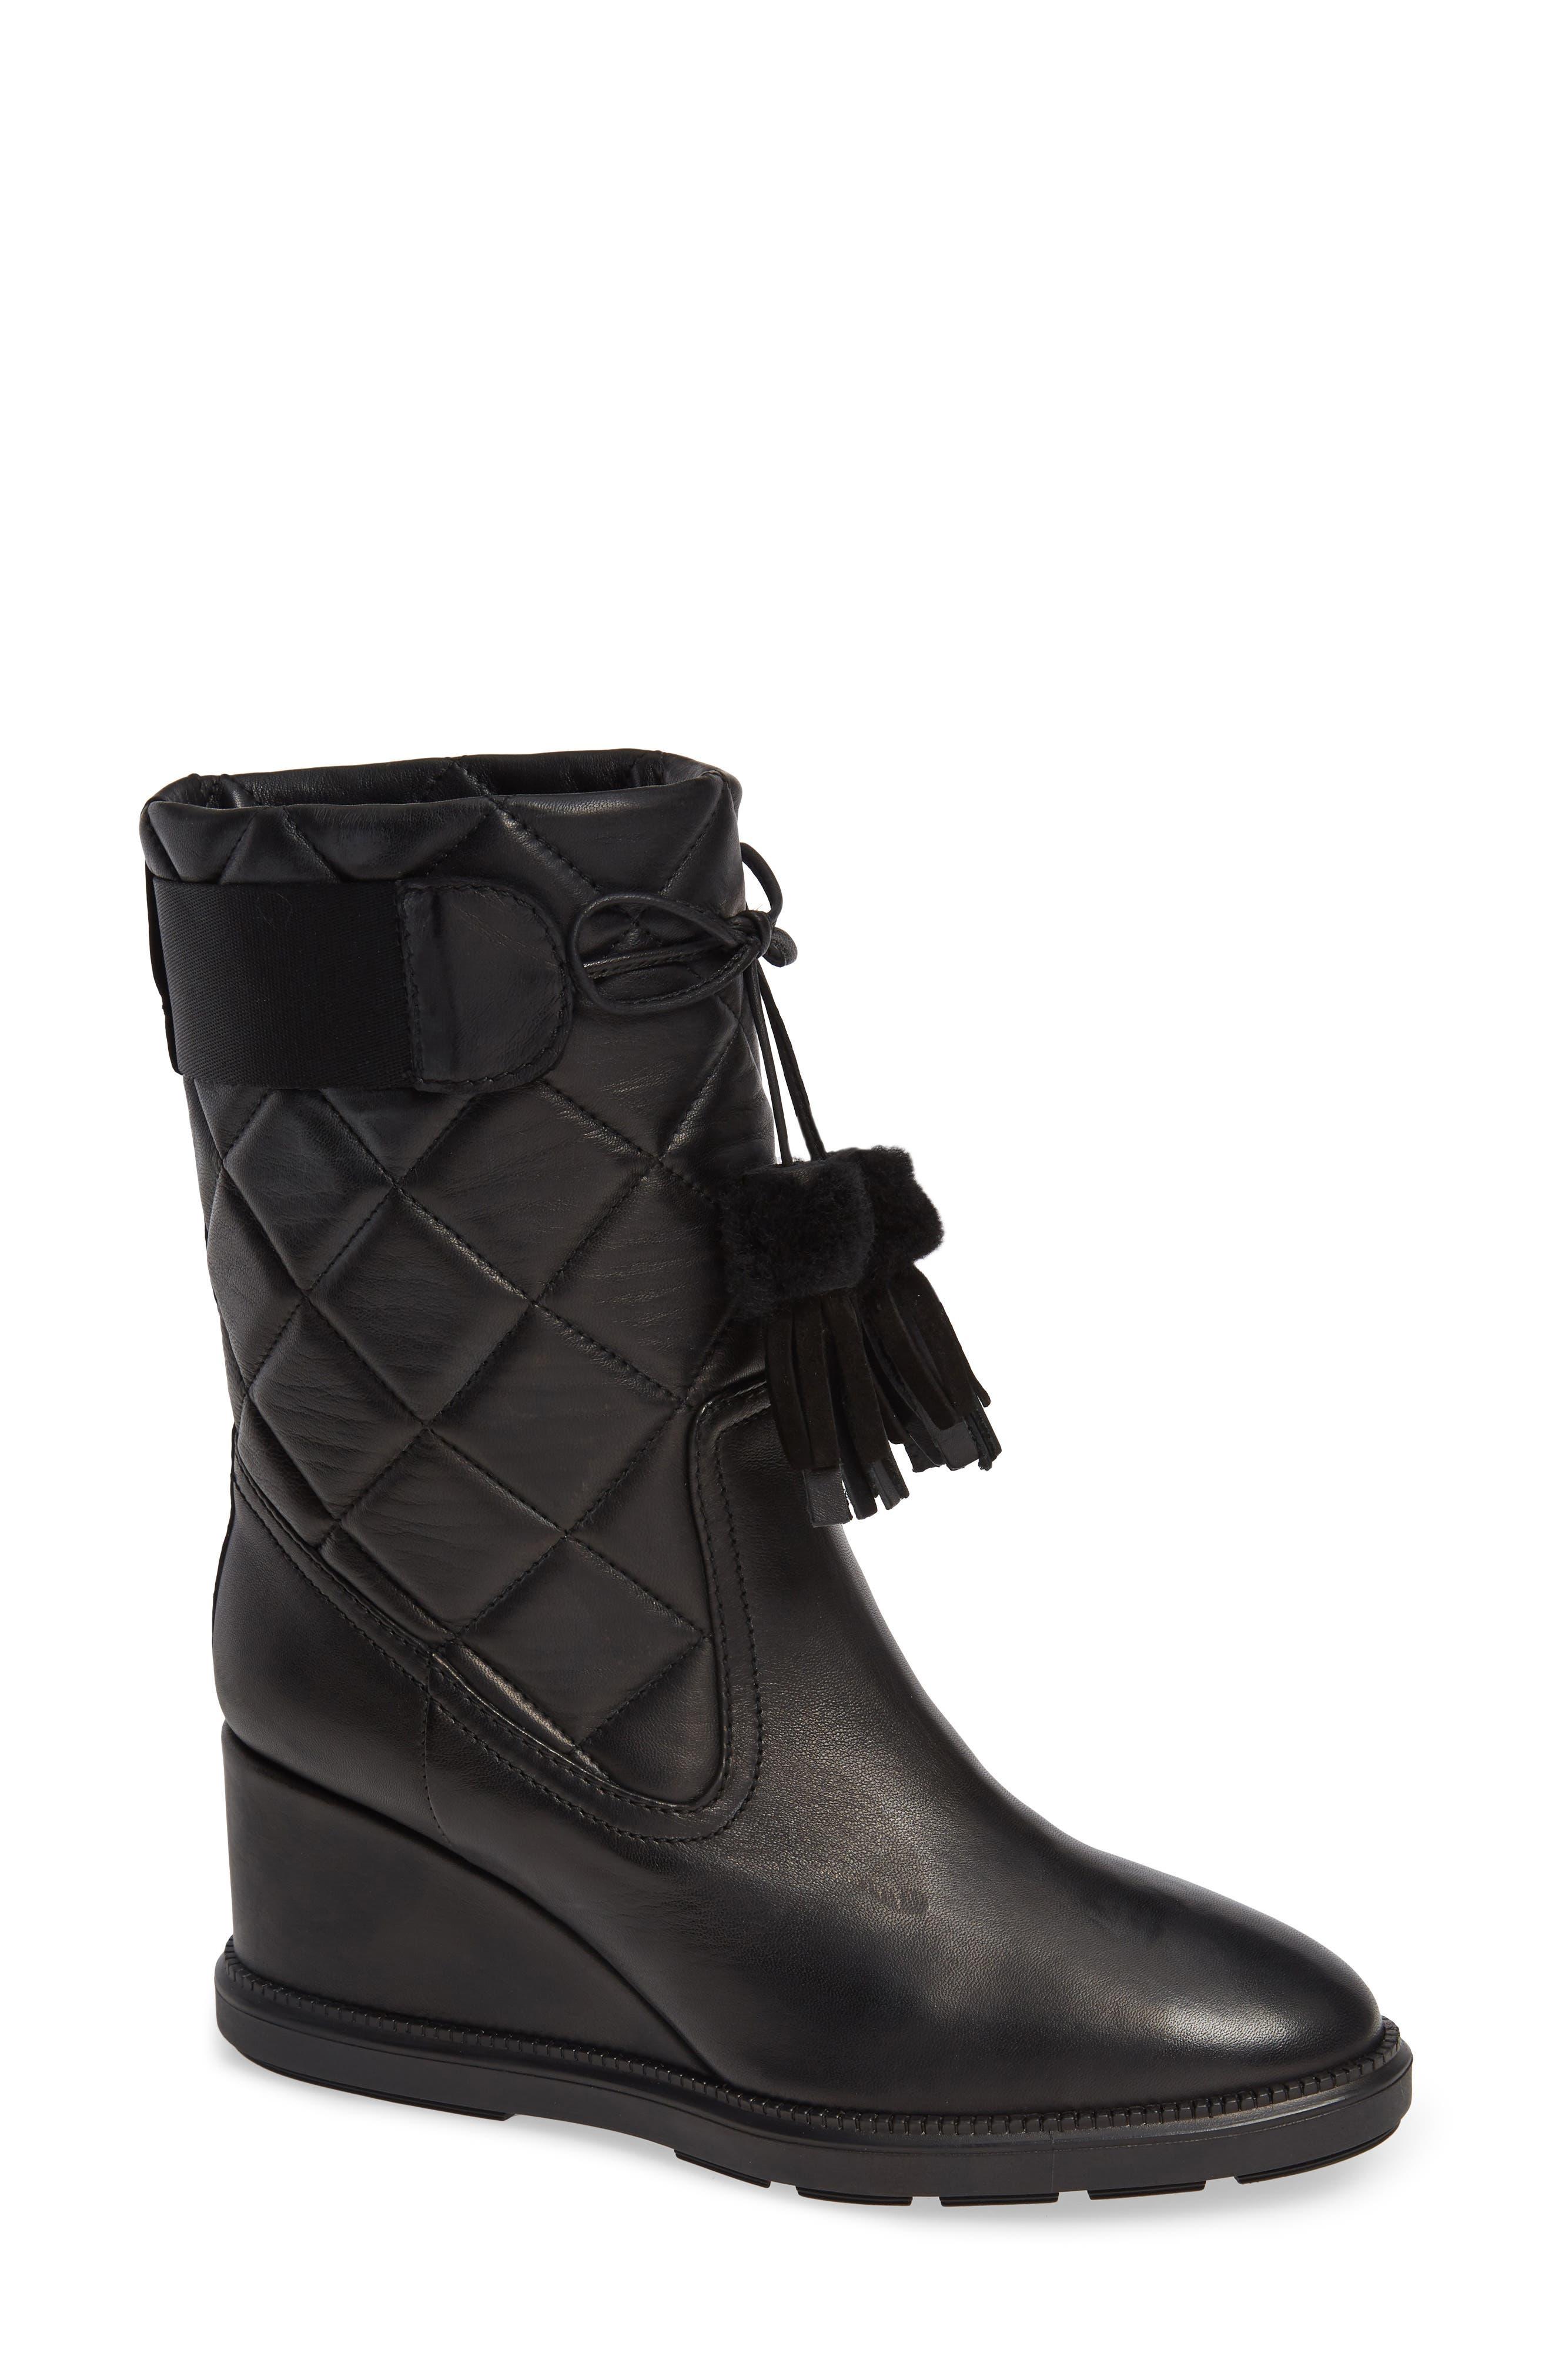 Aquatalia Caliana Water Resistant Genuine Shearling Lined Boot, Black